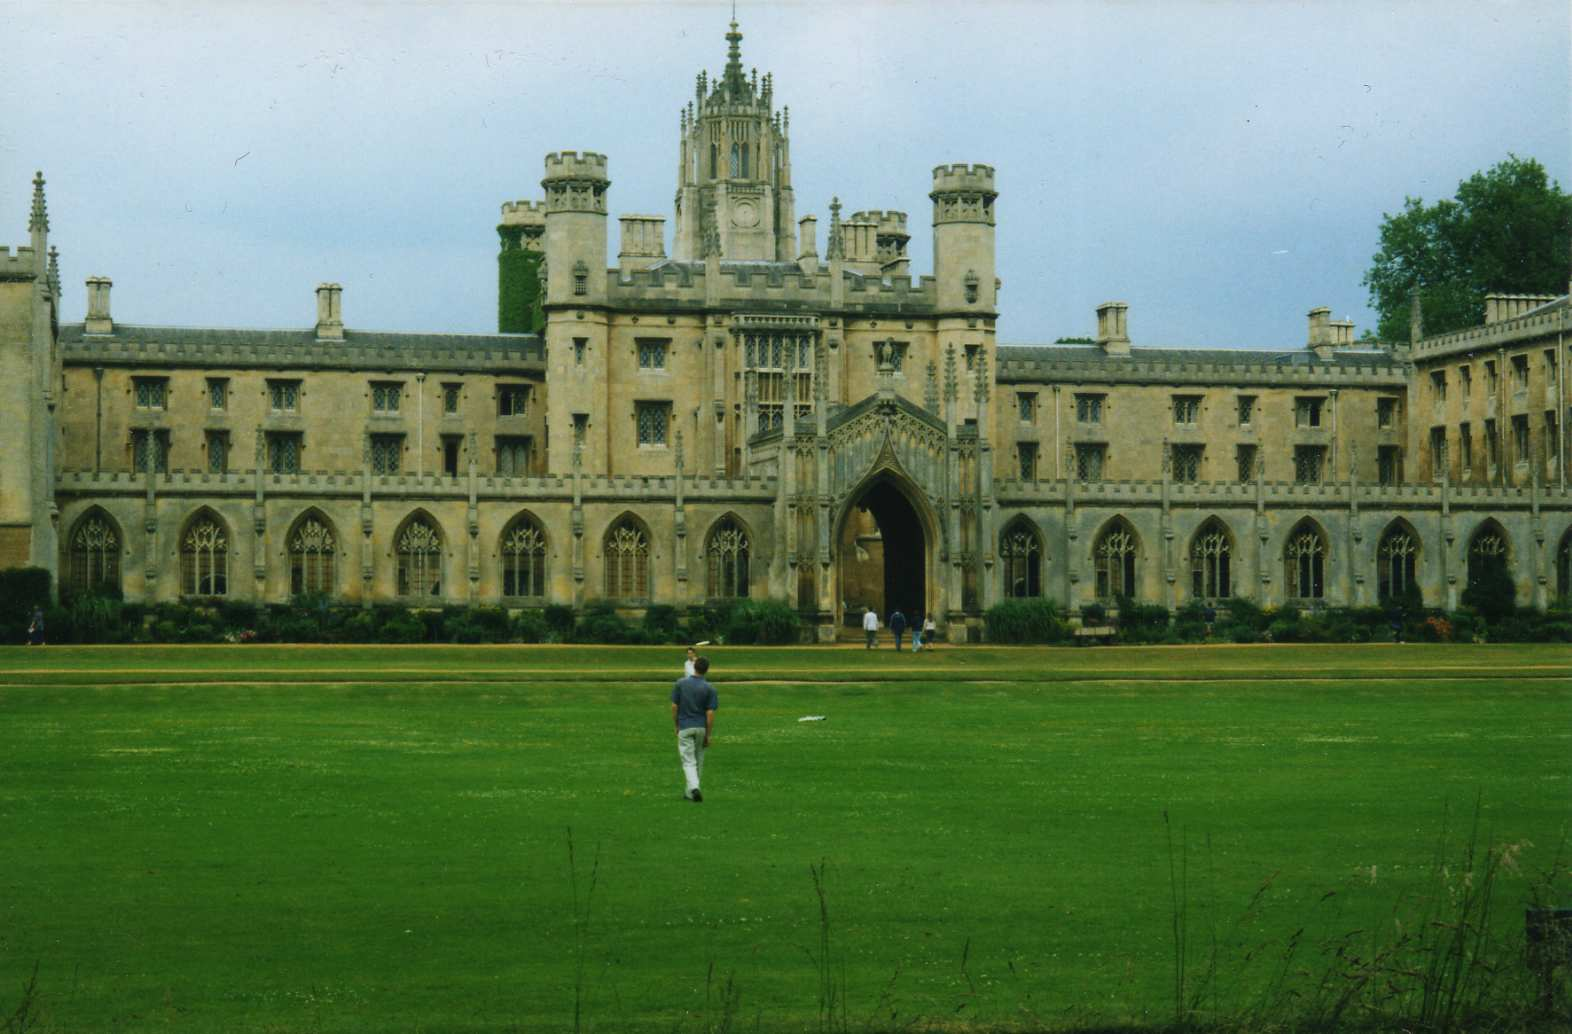 Part I: London & Cambridge